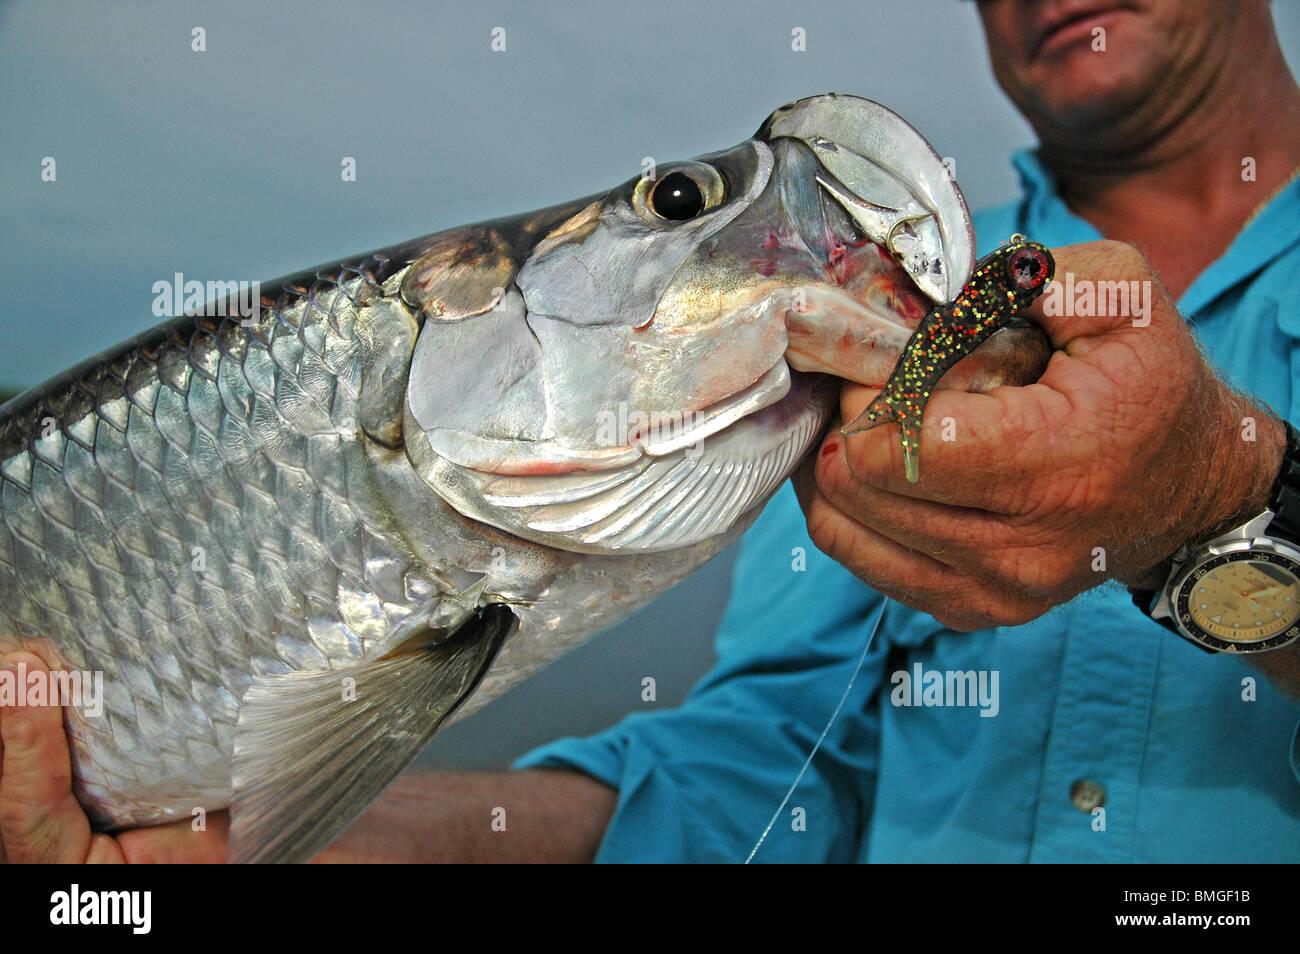 how to fish doa terroreyz